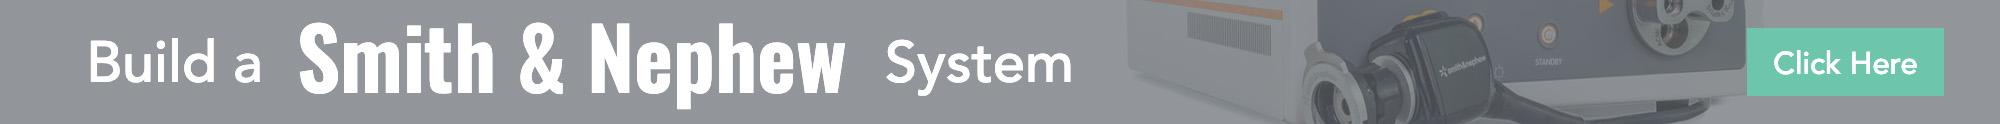 Dyonics ED-3 Camera System